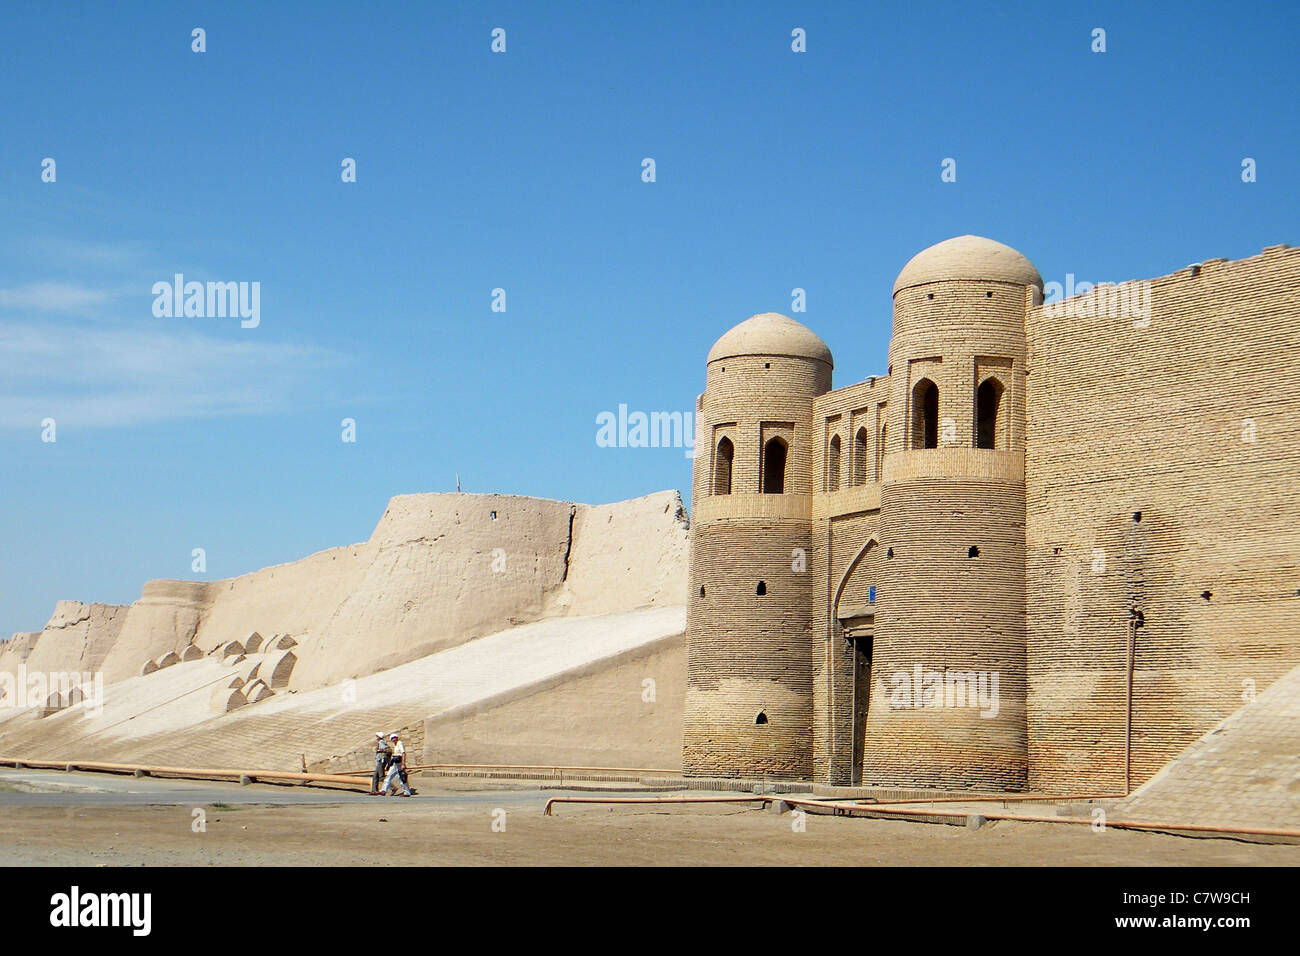 Uzbekistan, old town of Khiva, Gate Ota Darvoza - Stock Image